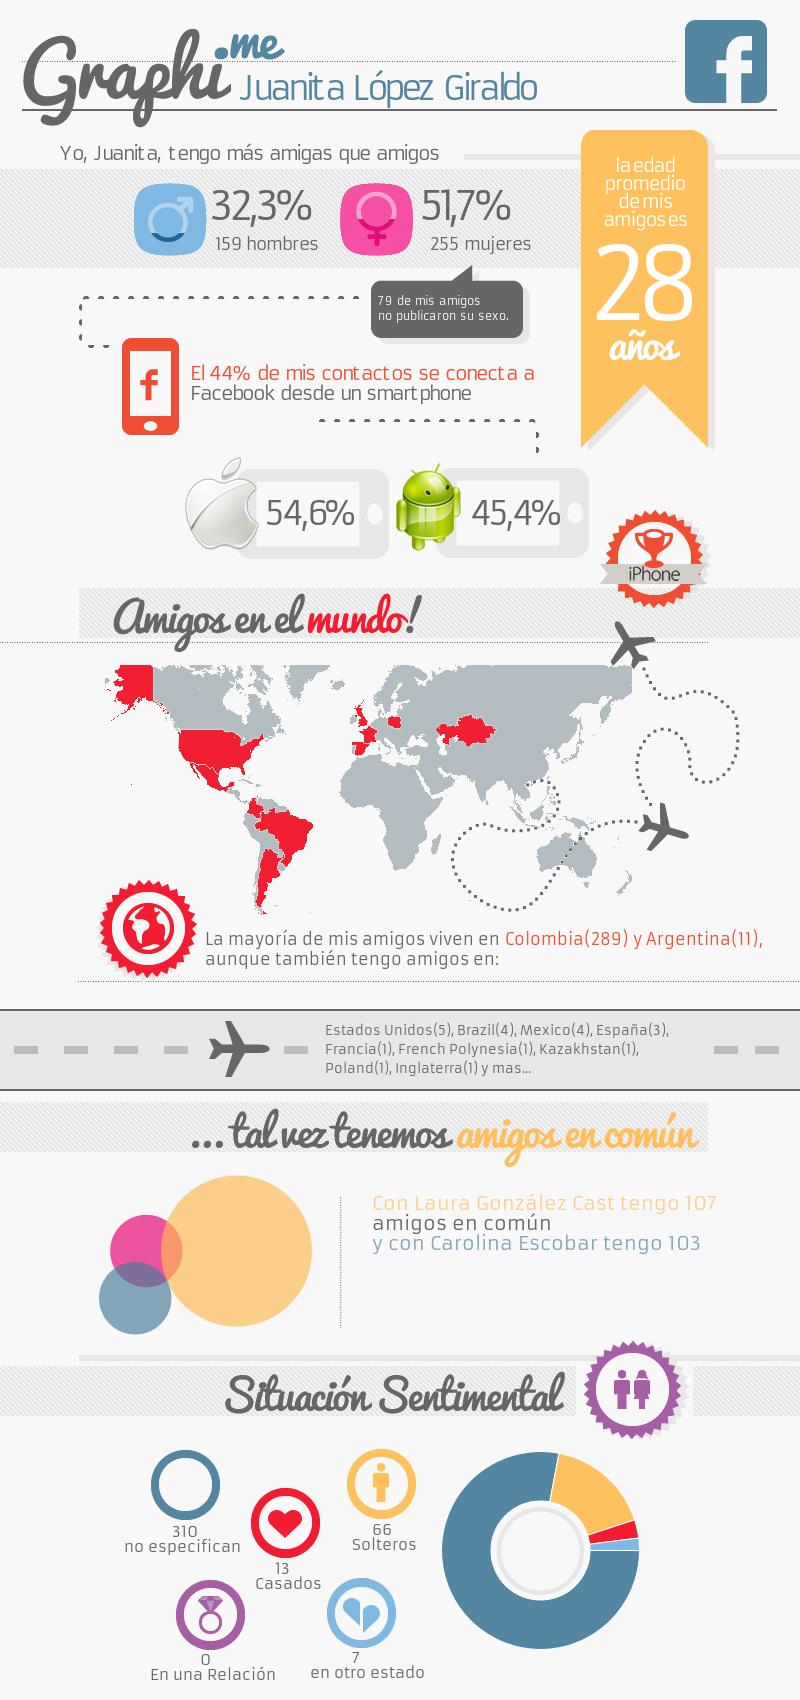 Graphi.me - Juanita López Giraldo